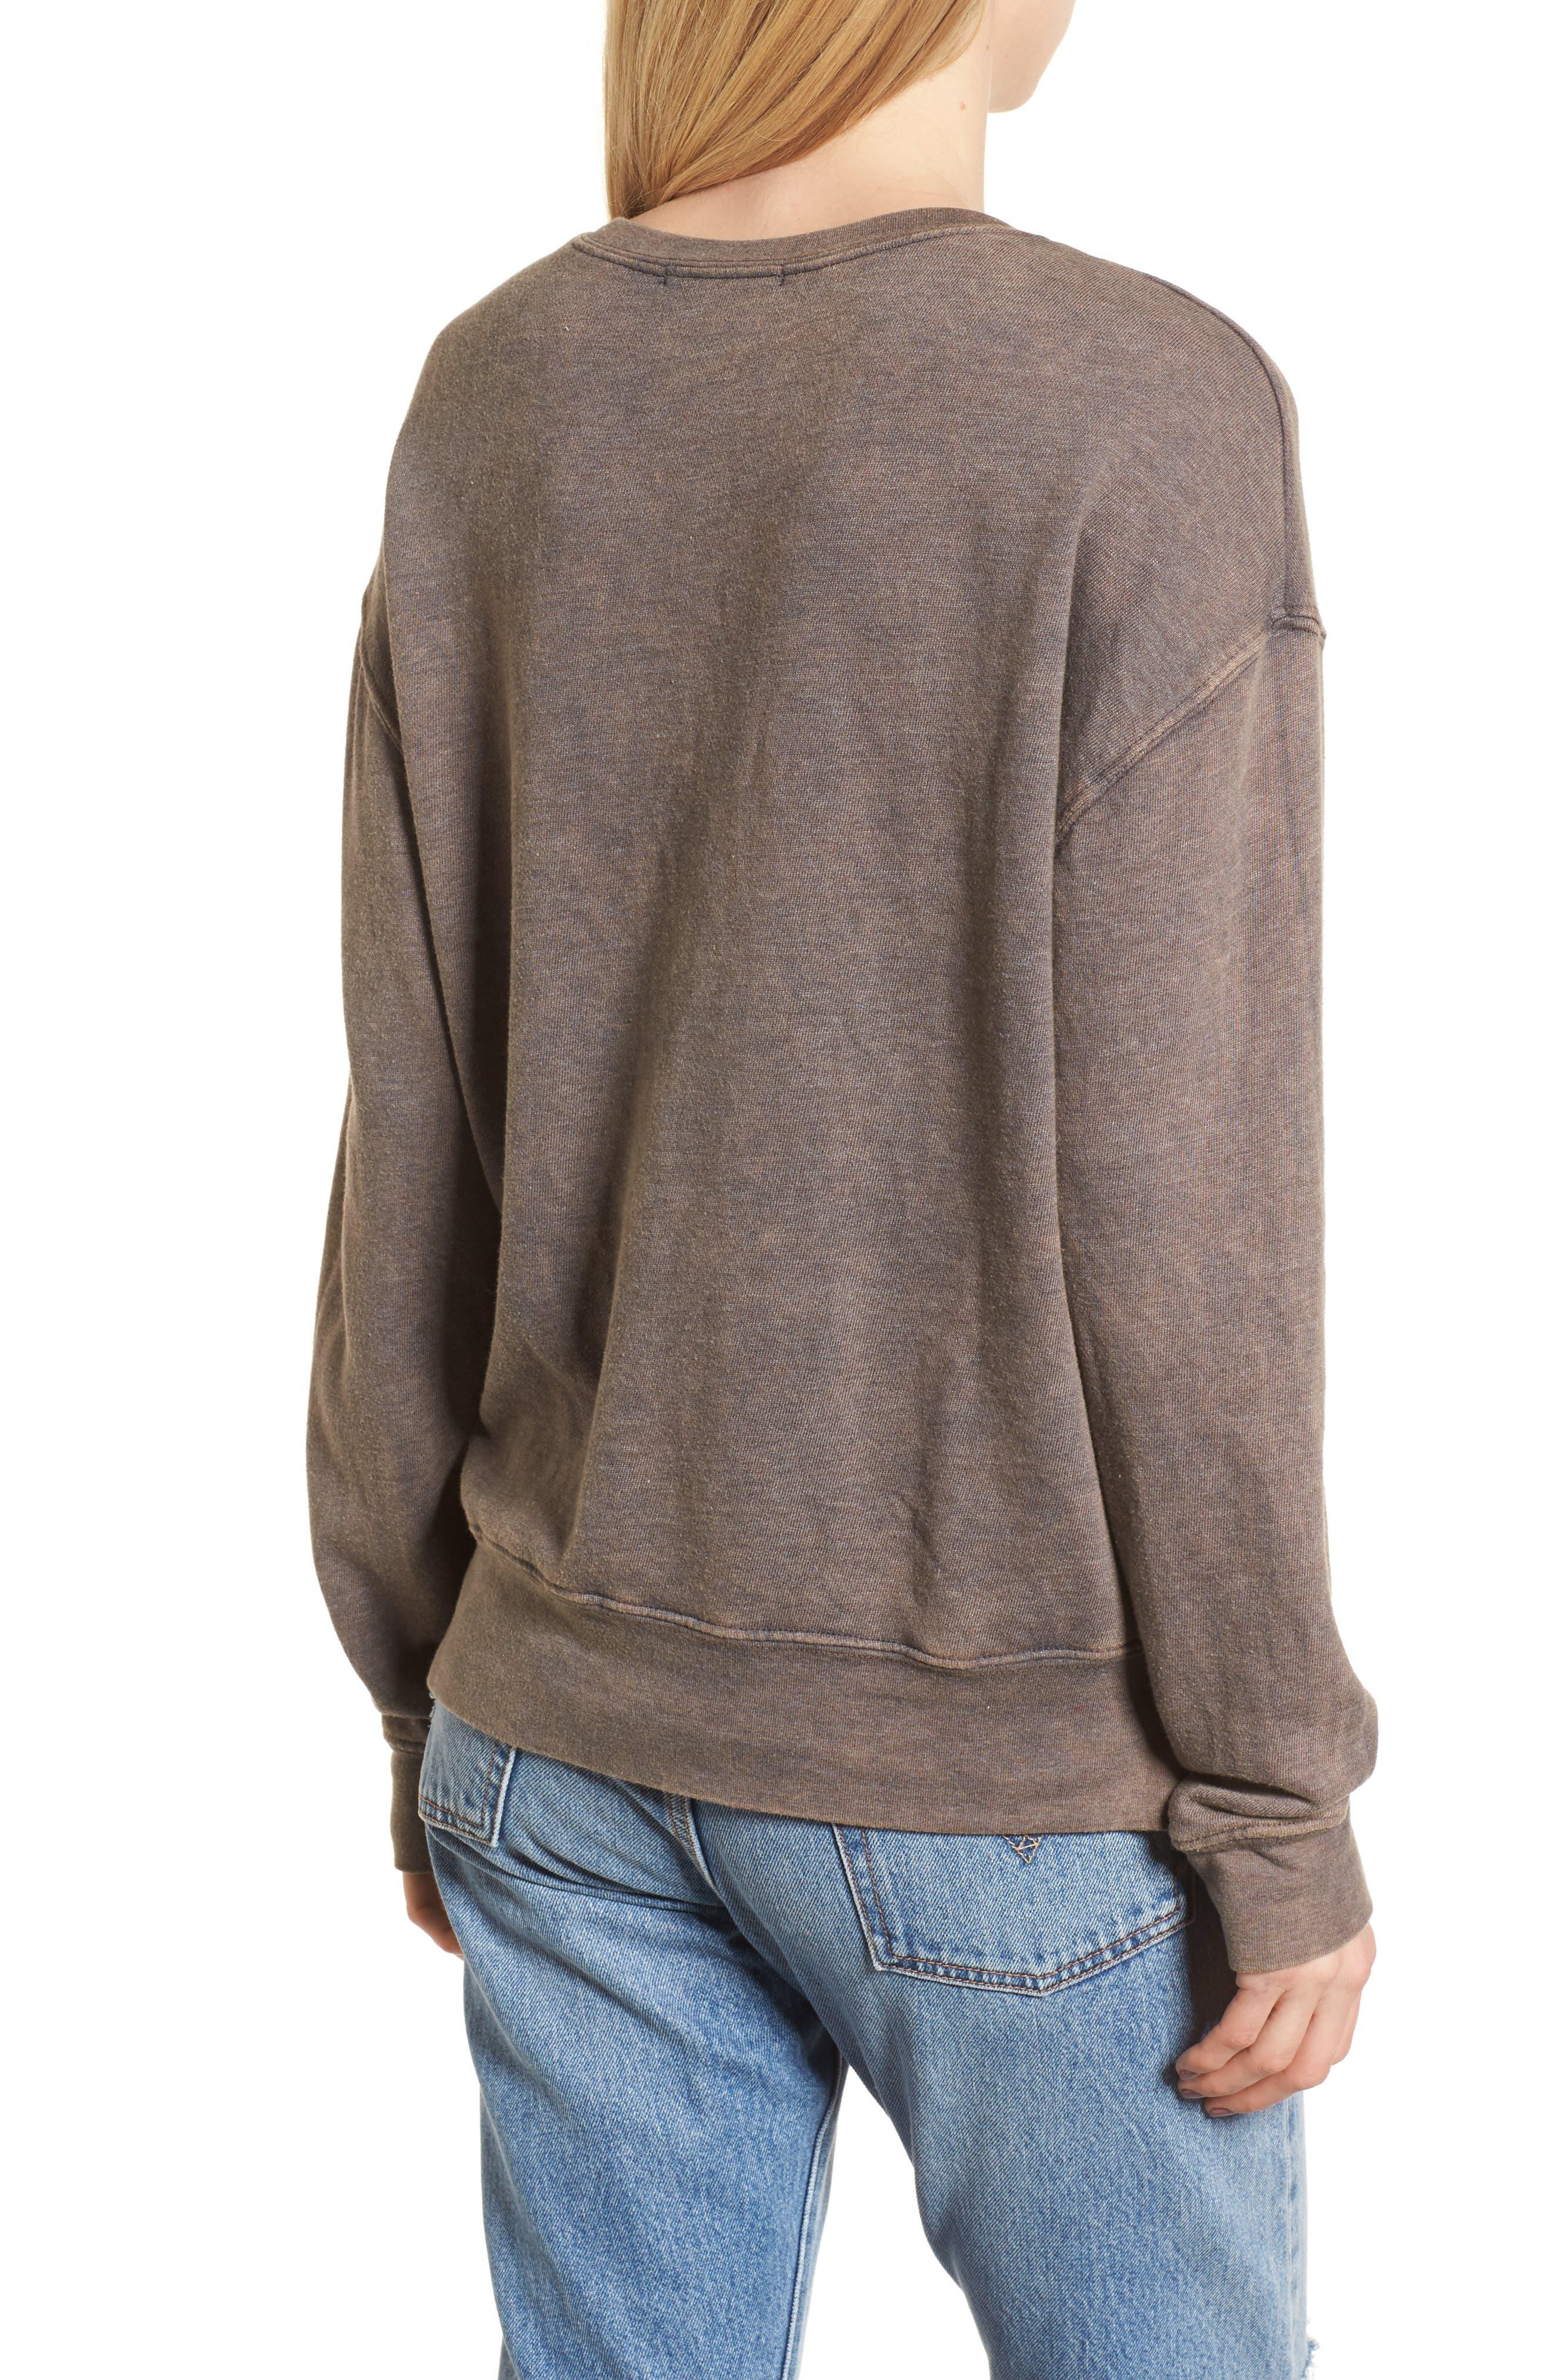 Always Take the Long Way Home Sweatshirt,                             Alternate thumbnail 2, color,                             Vintage Black